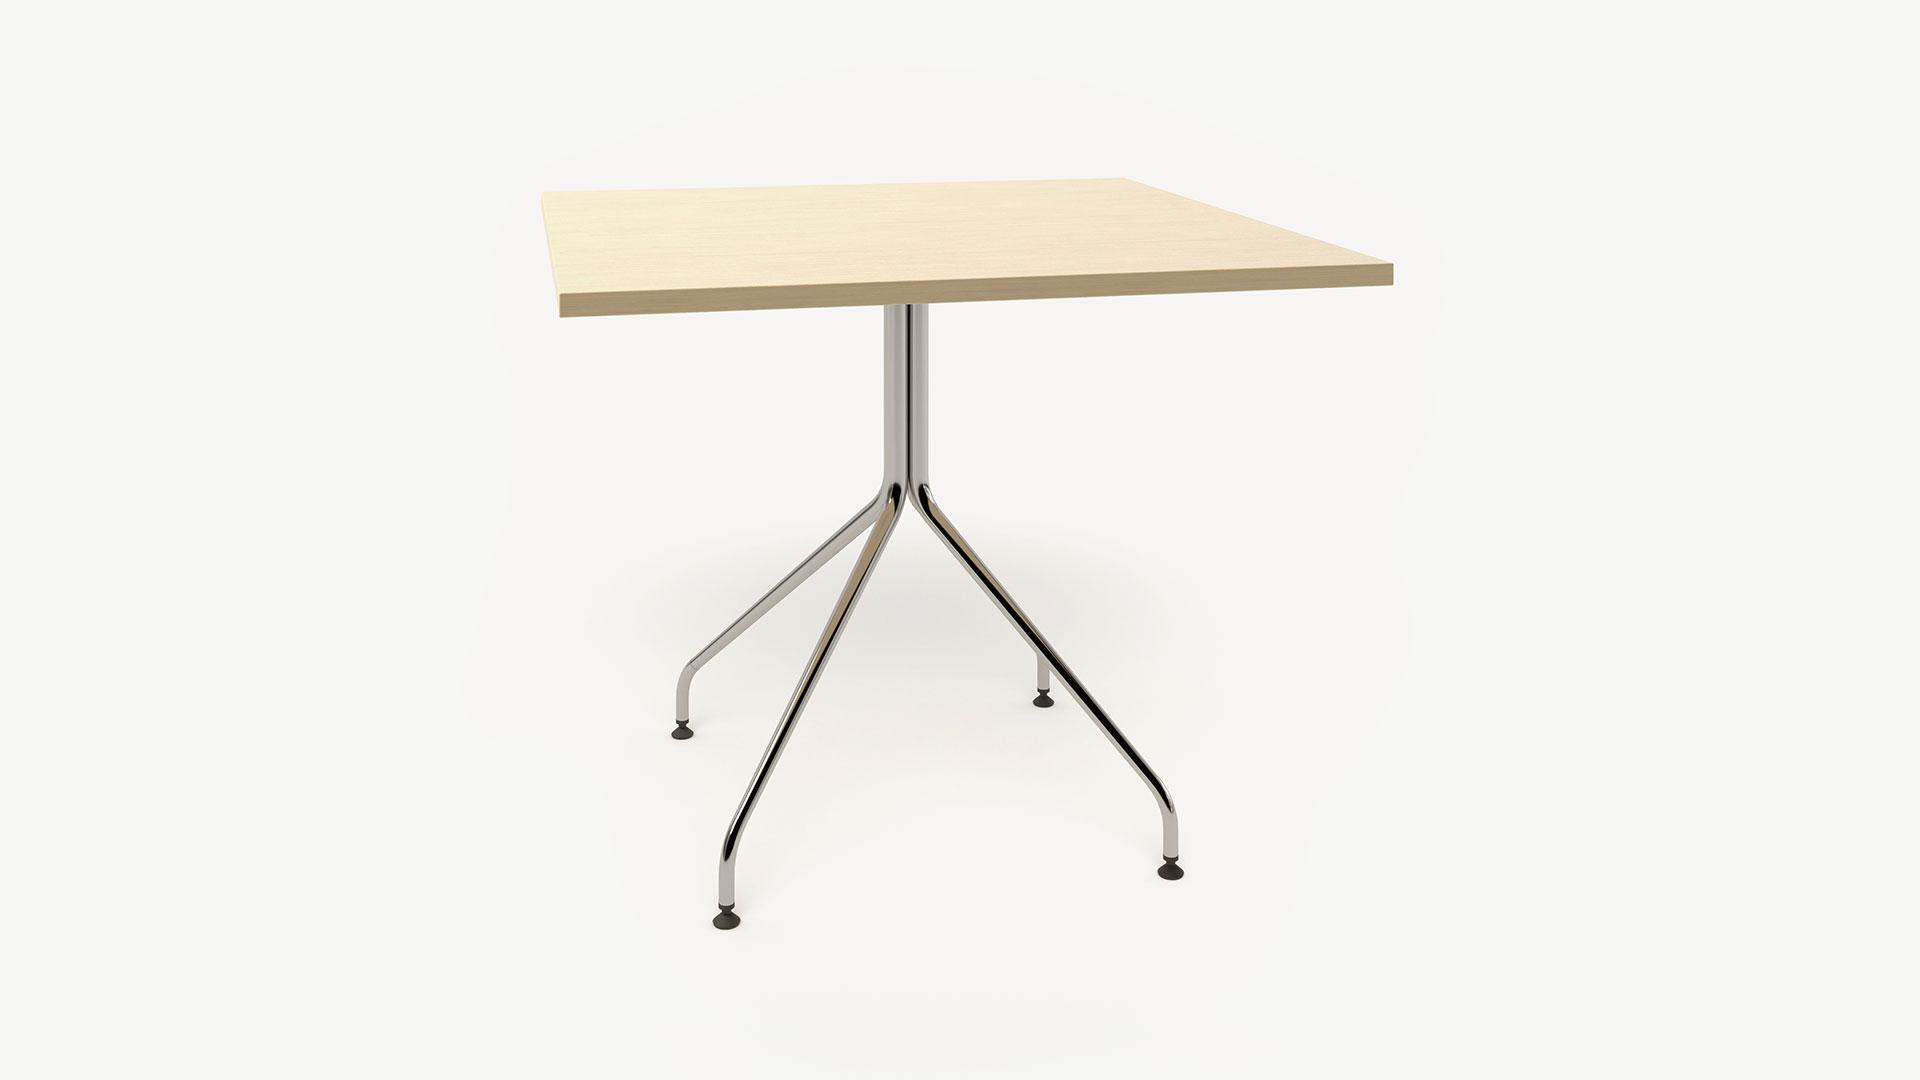 Tisch Fiore quadratisch - DAUPHIN